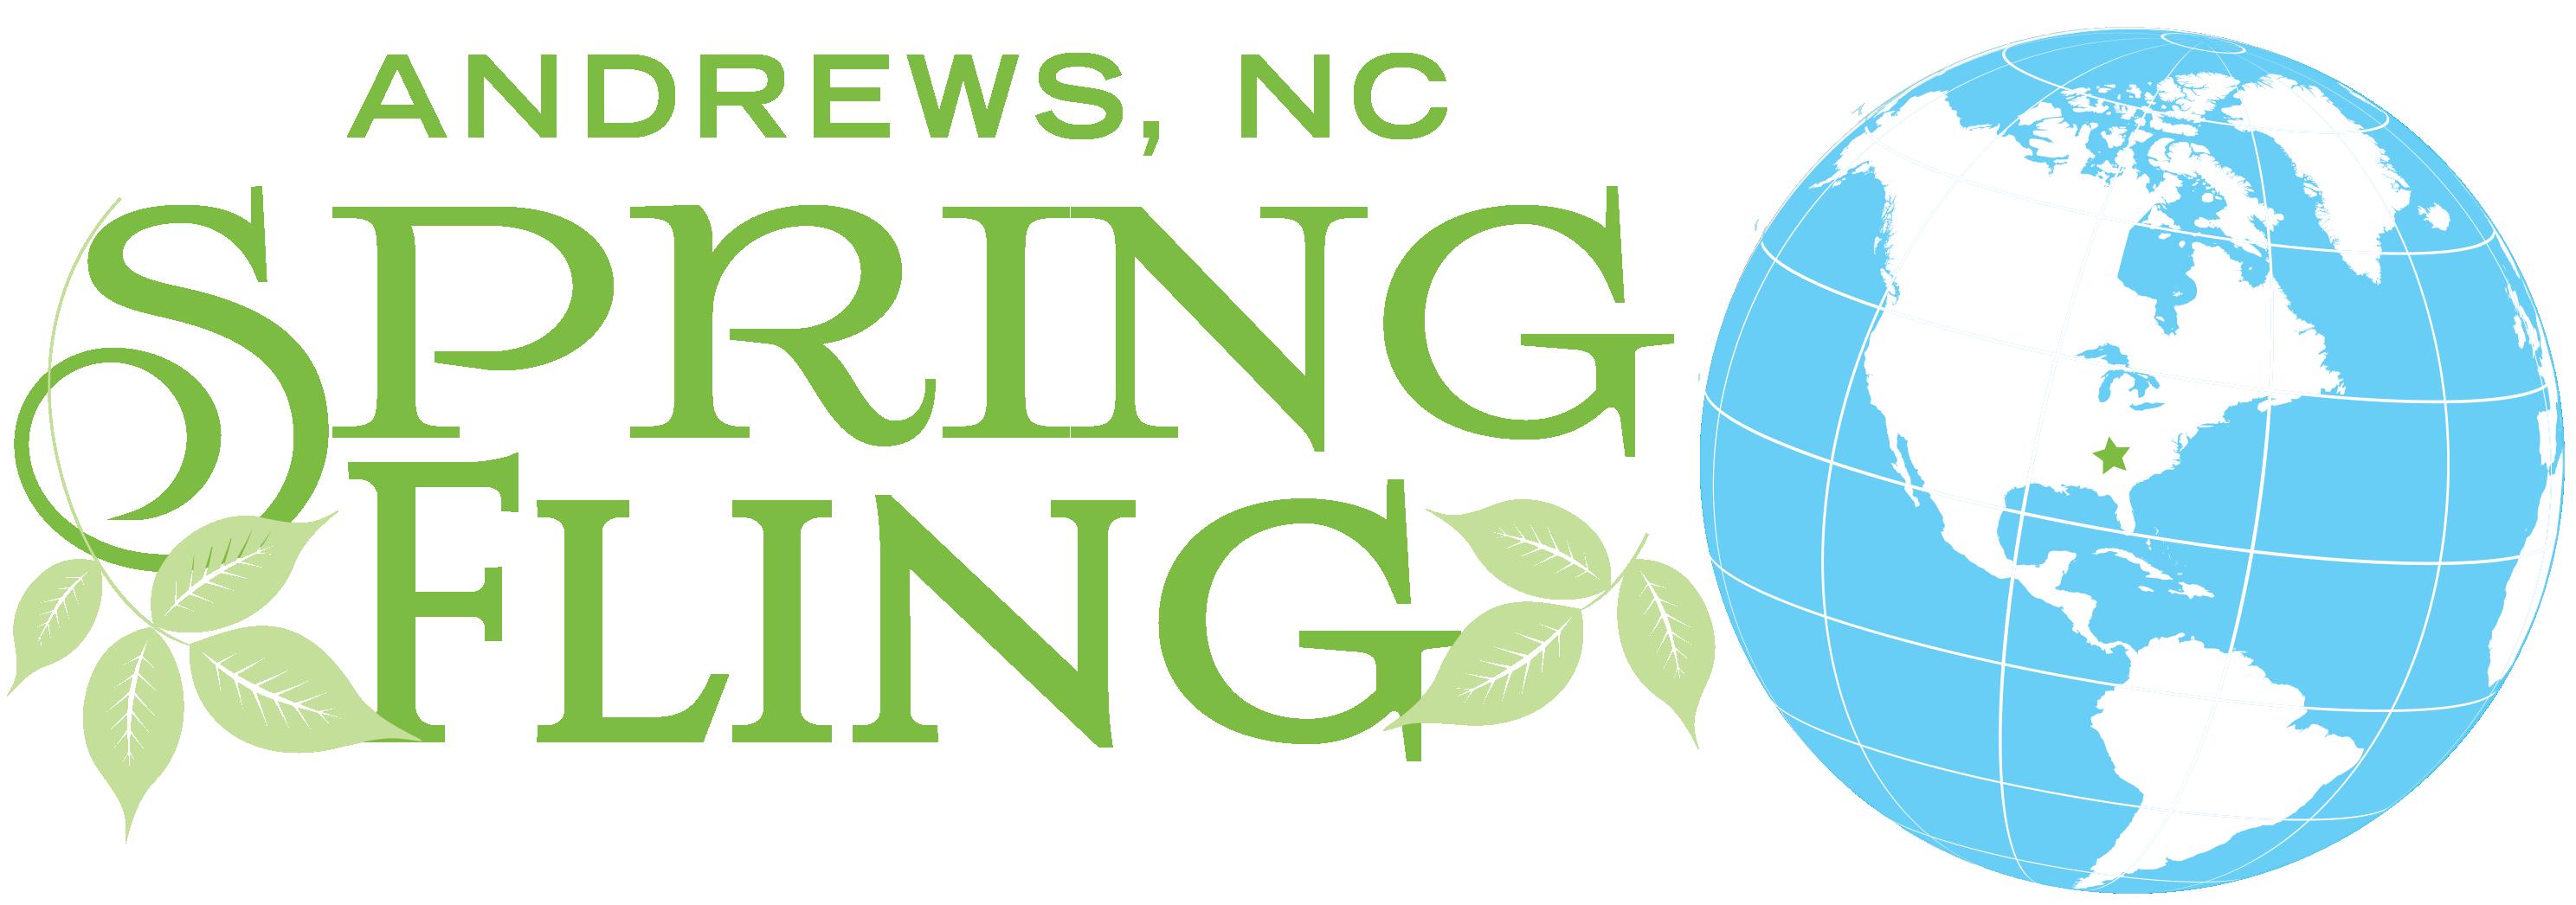 Andrews NC Spring Fling